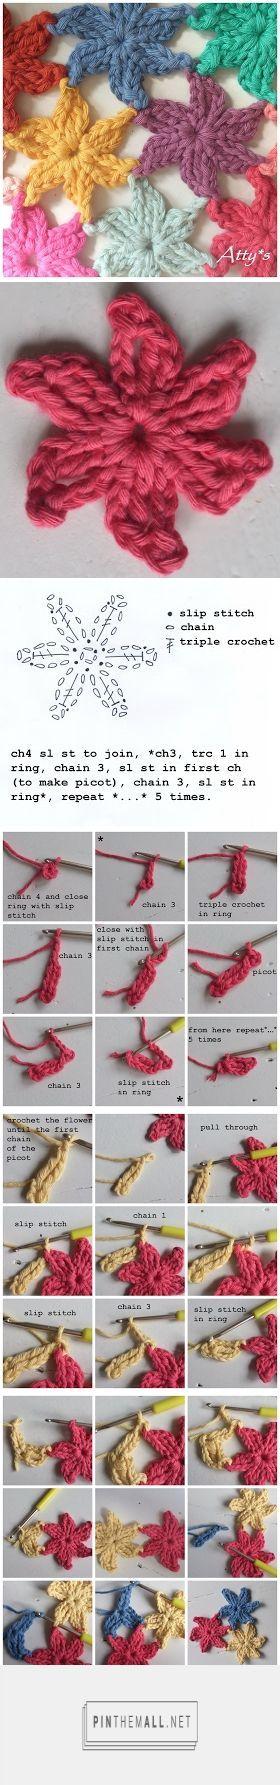 #Crochet_Tutorial - Join as you go flowers. Great idea! Enjoy from #KnittingGuru ** http://www.pinterest.com/KnittingGuru: